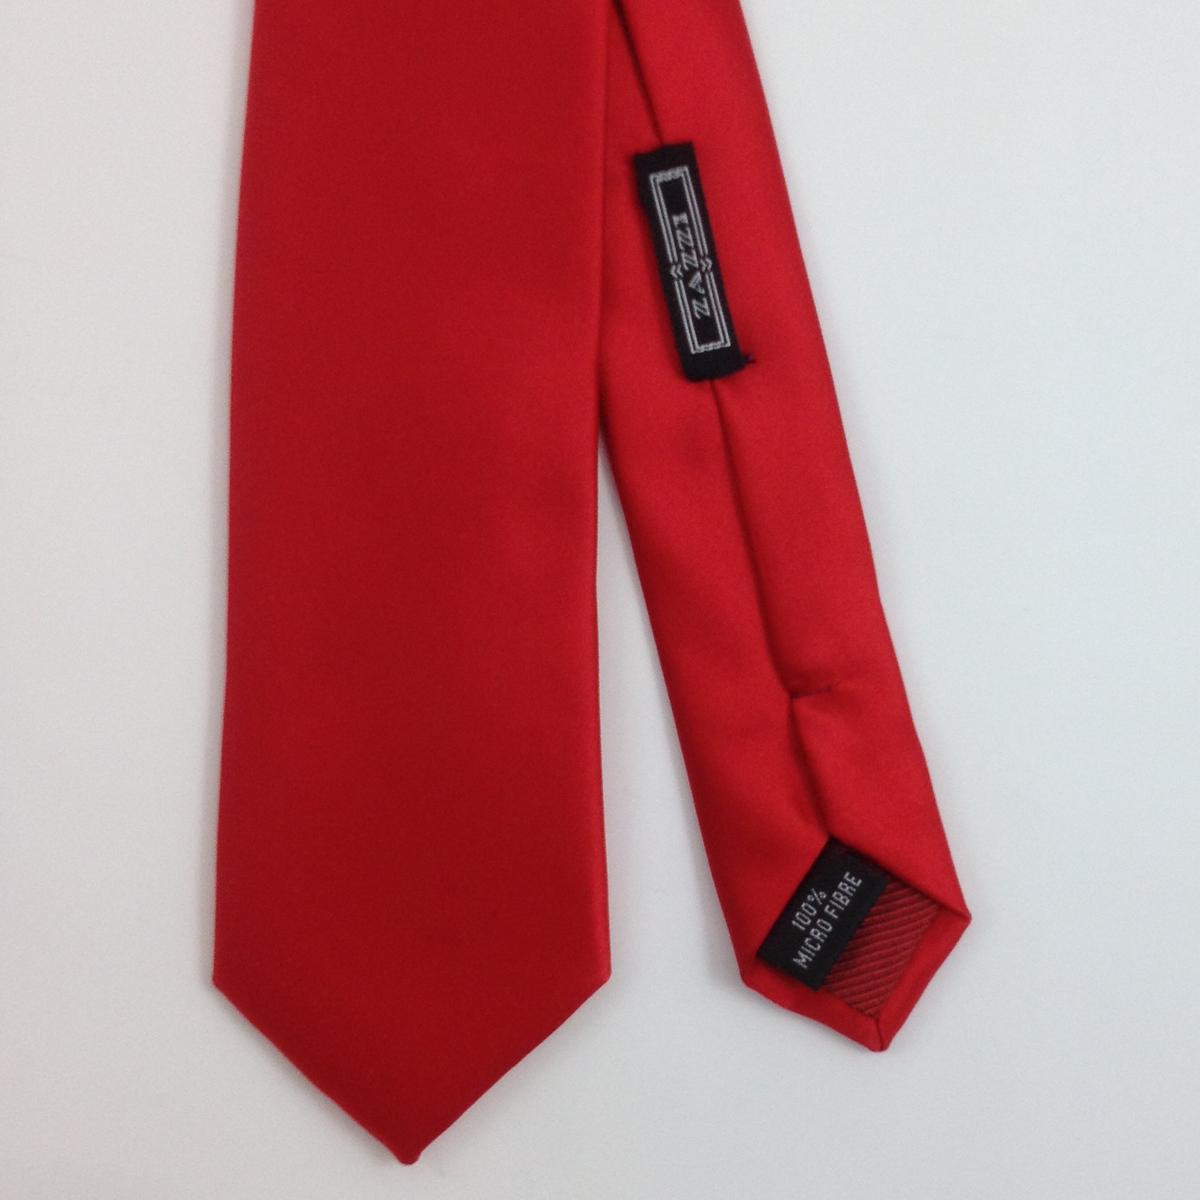 satin plain red r mens ties facemasks con murphys menswear cork - - Con Murphys Menswear